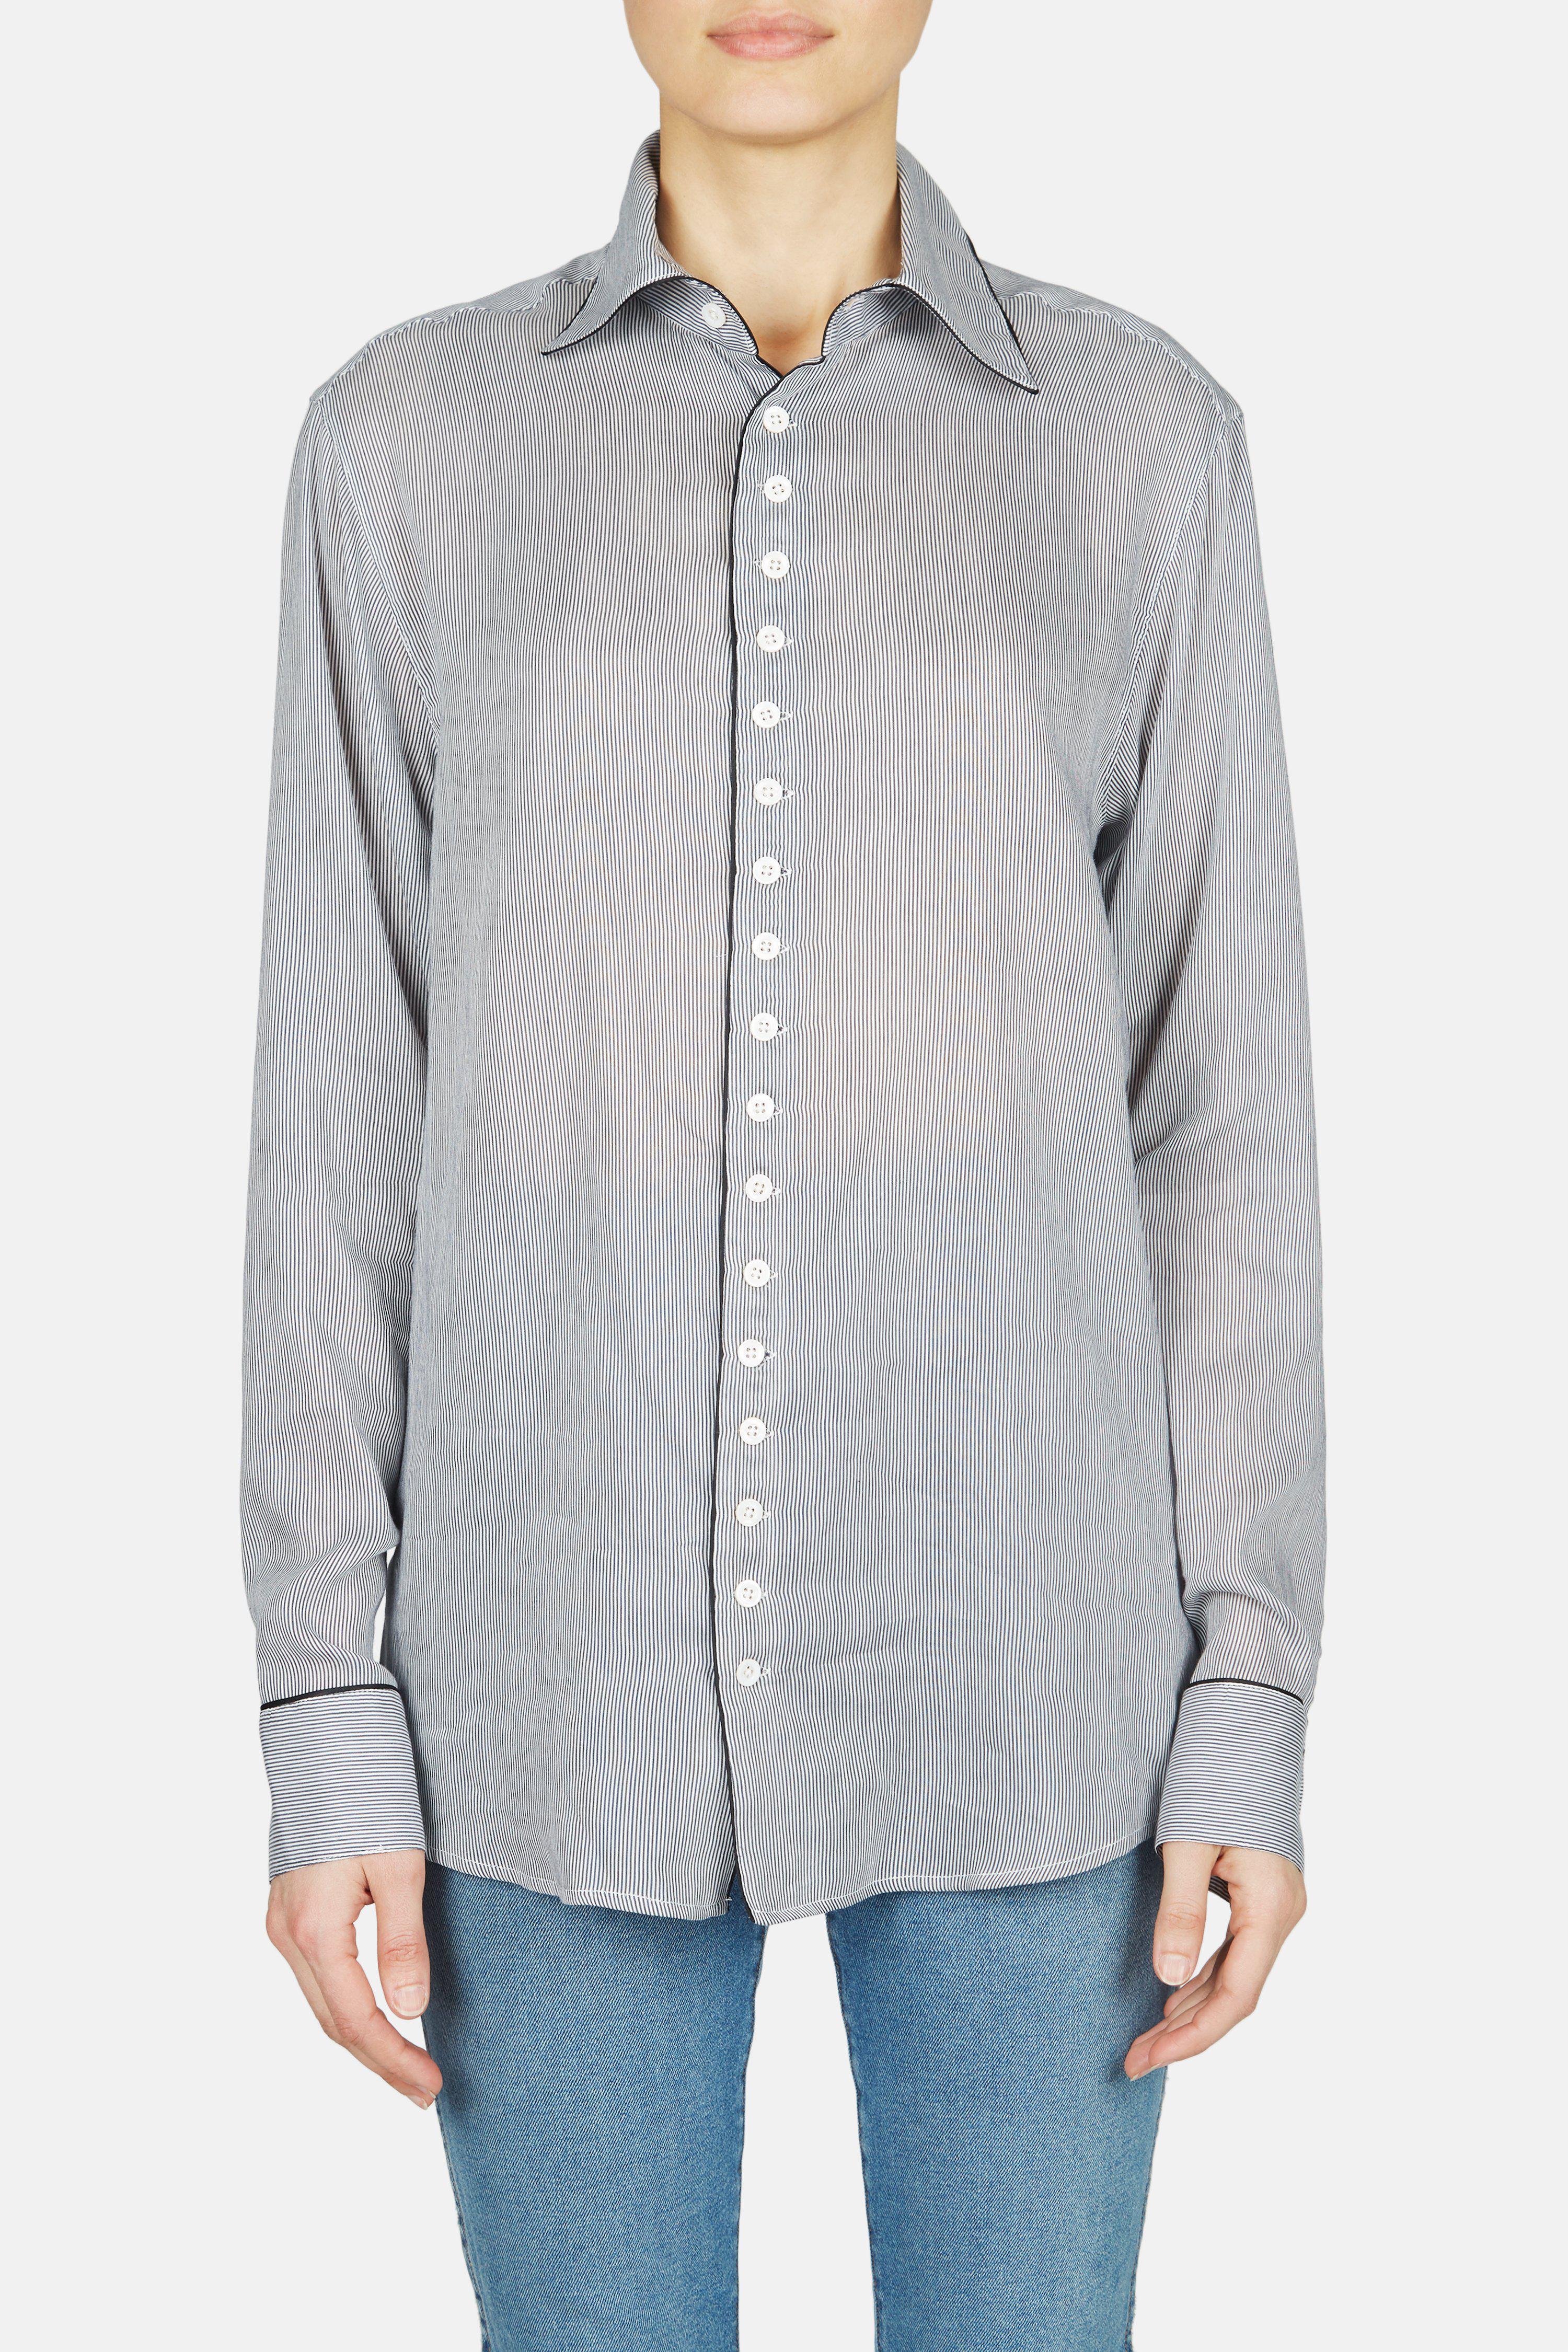 Lyst - Kiki de Montparnasse Cotton Striped Boyfriend Shirt in Gray 8ac2ef742